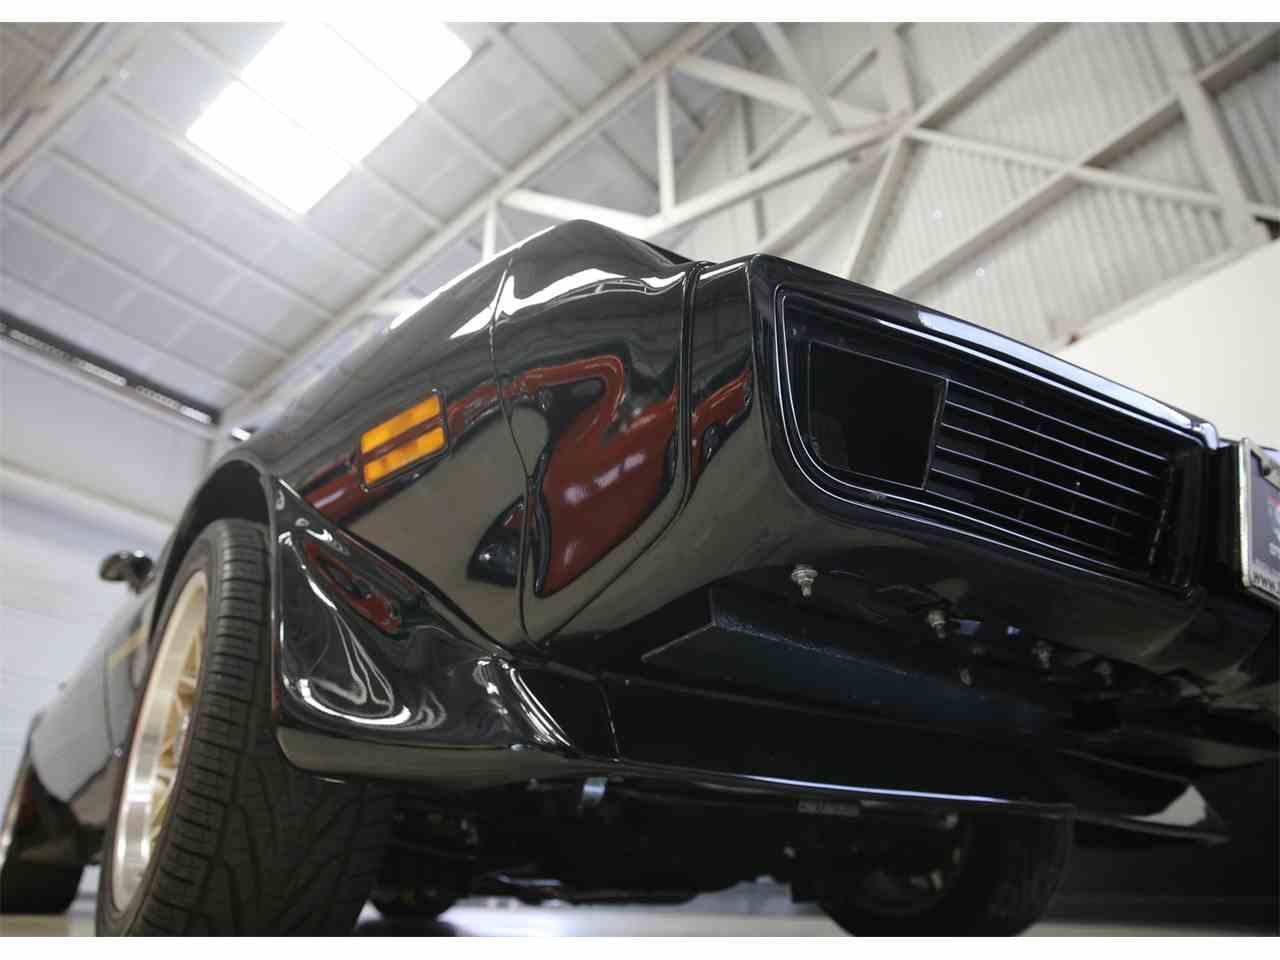 Large Picture of 1979 Pontiac Firebird located in Fairfield California - $34,990.00 - KQ8J